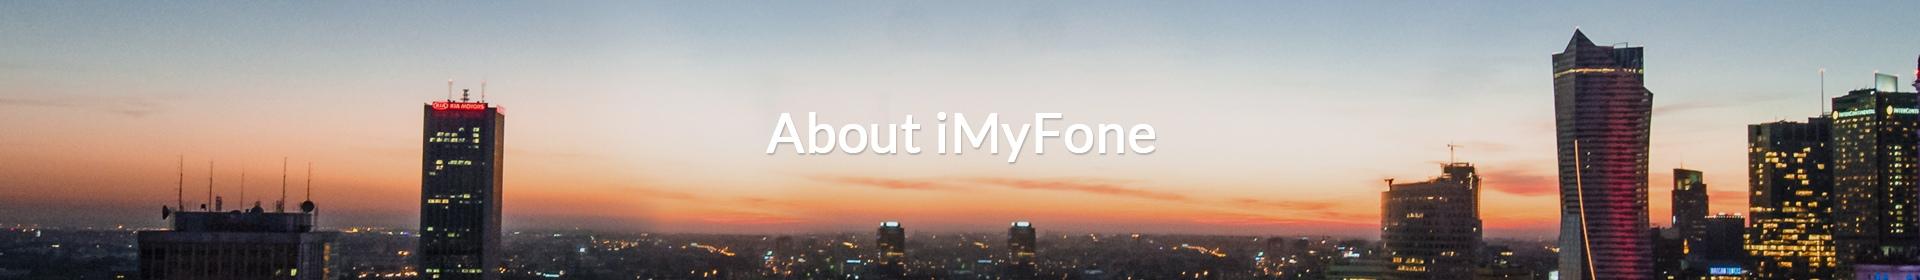 About iMyFone